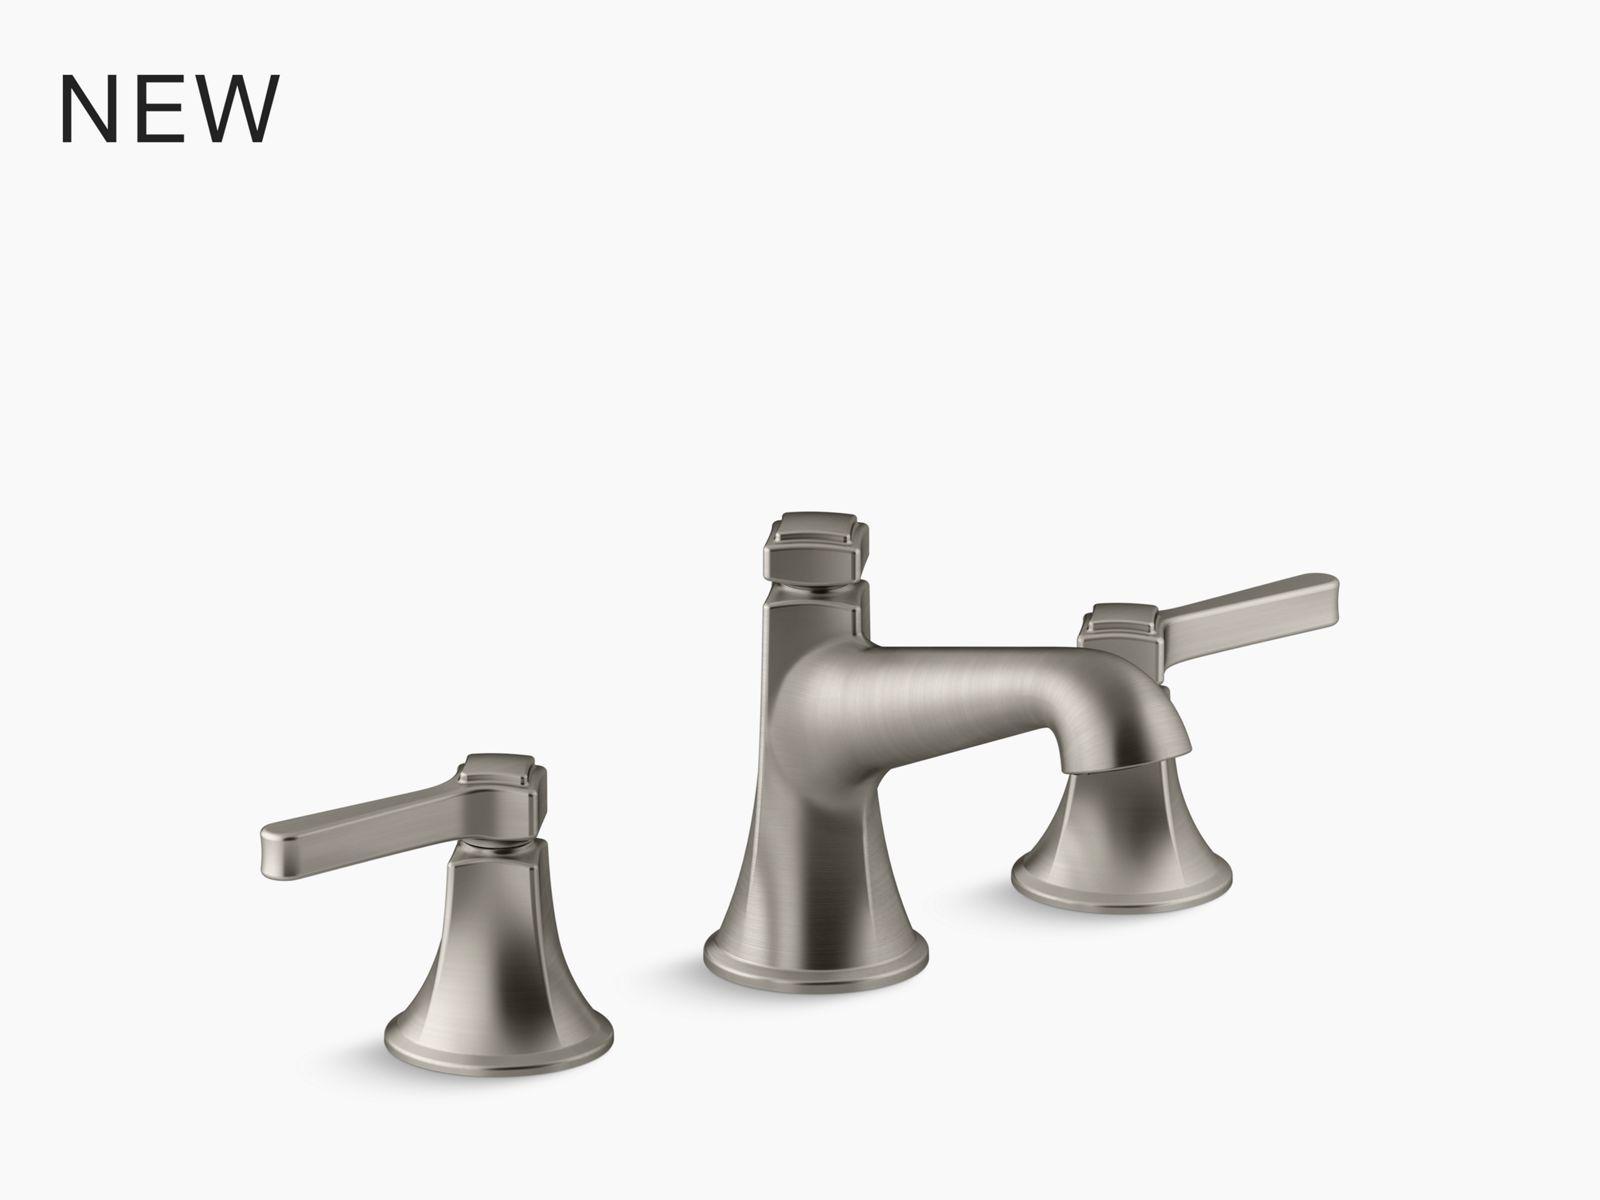 vault 33 x 22 x 9 5 16 smart divide top mount undermount large medium double bowl kitchen sink with 4 faucet holes